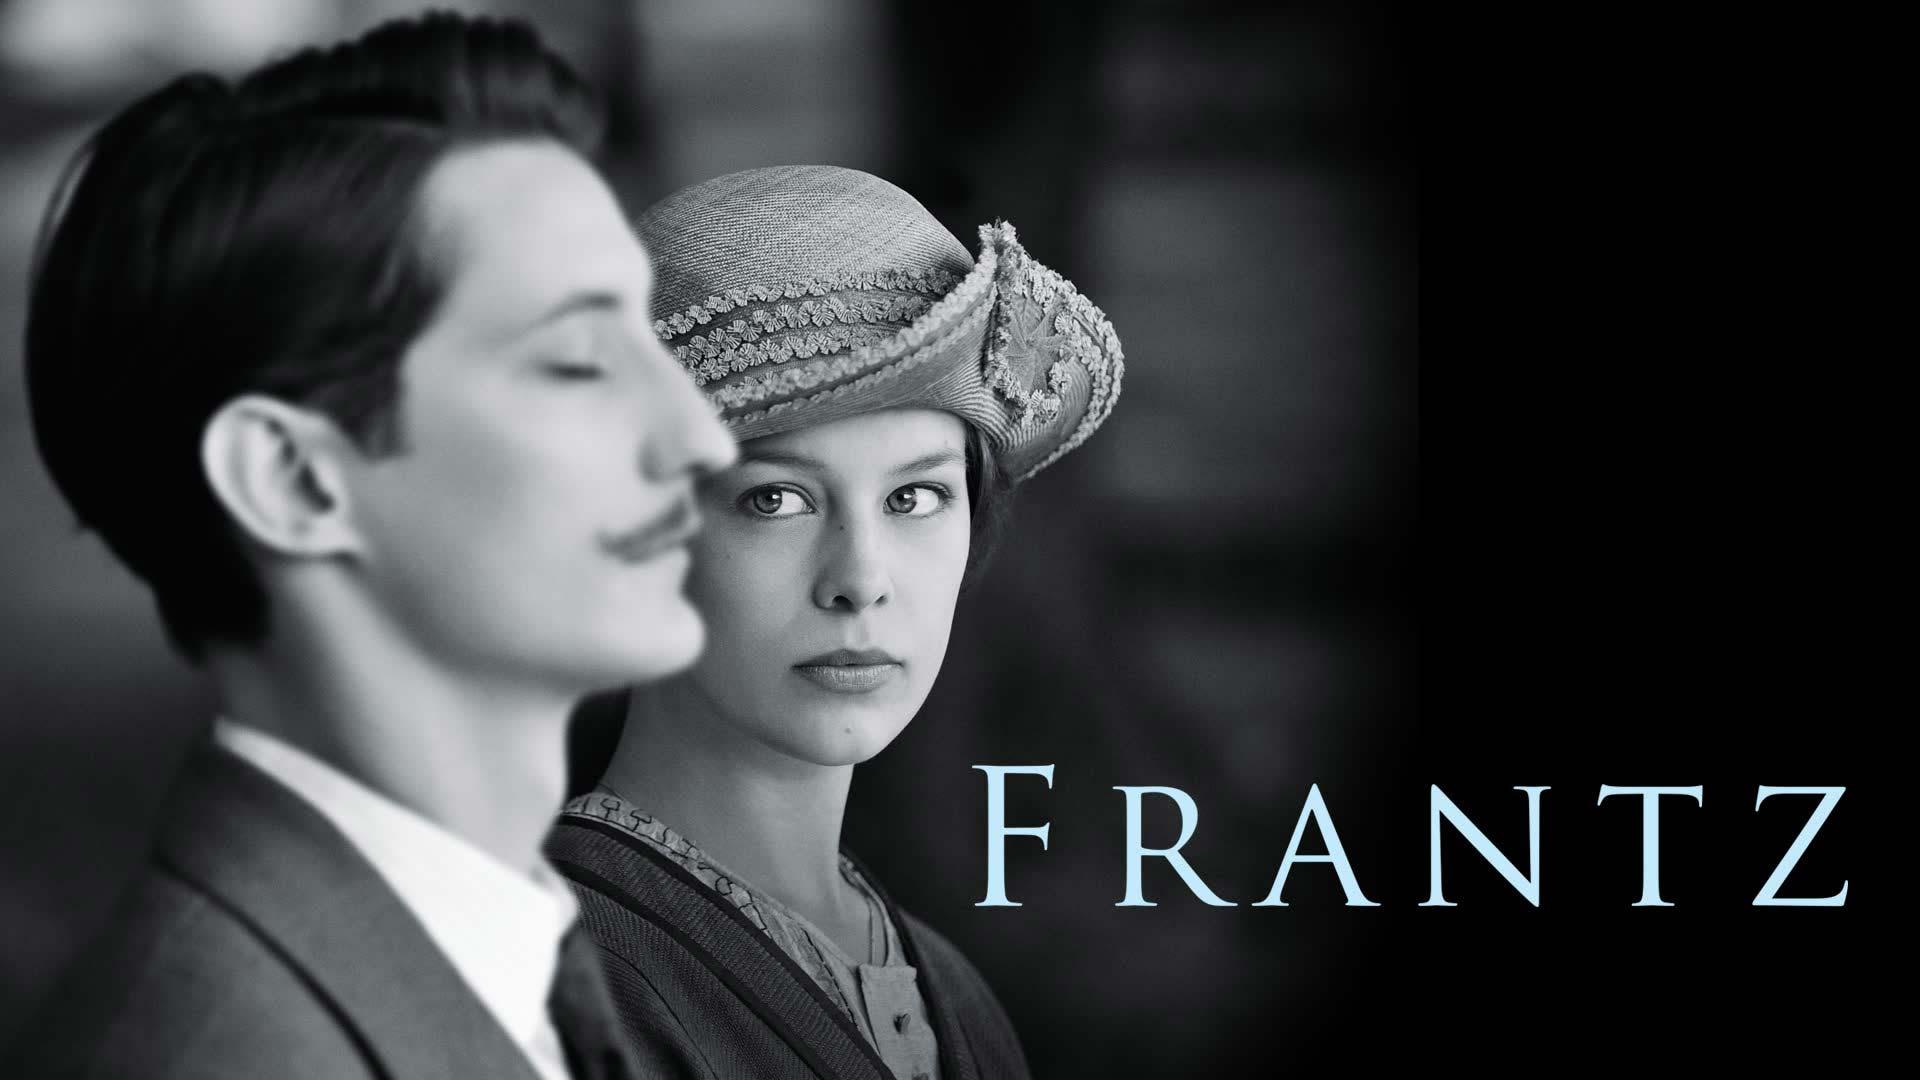 Frantz - image